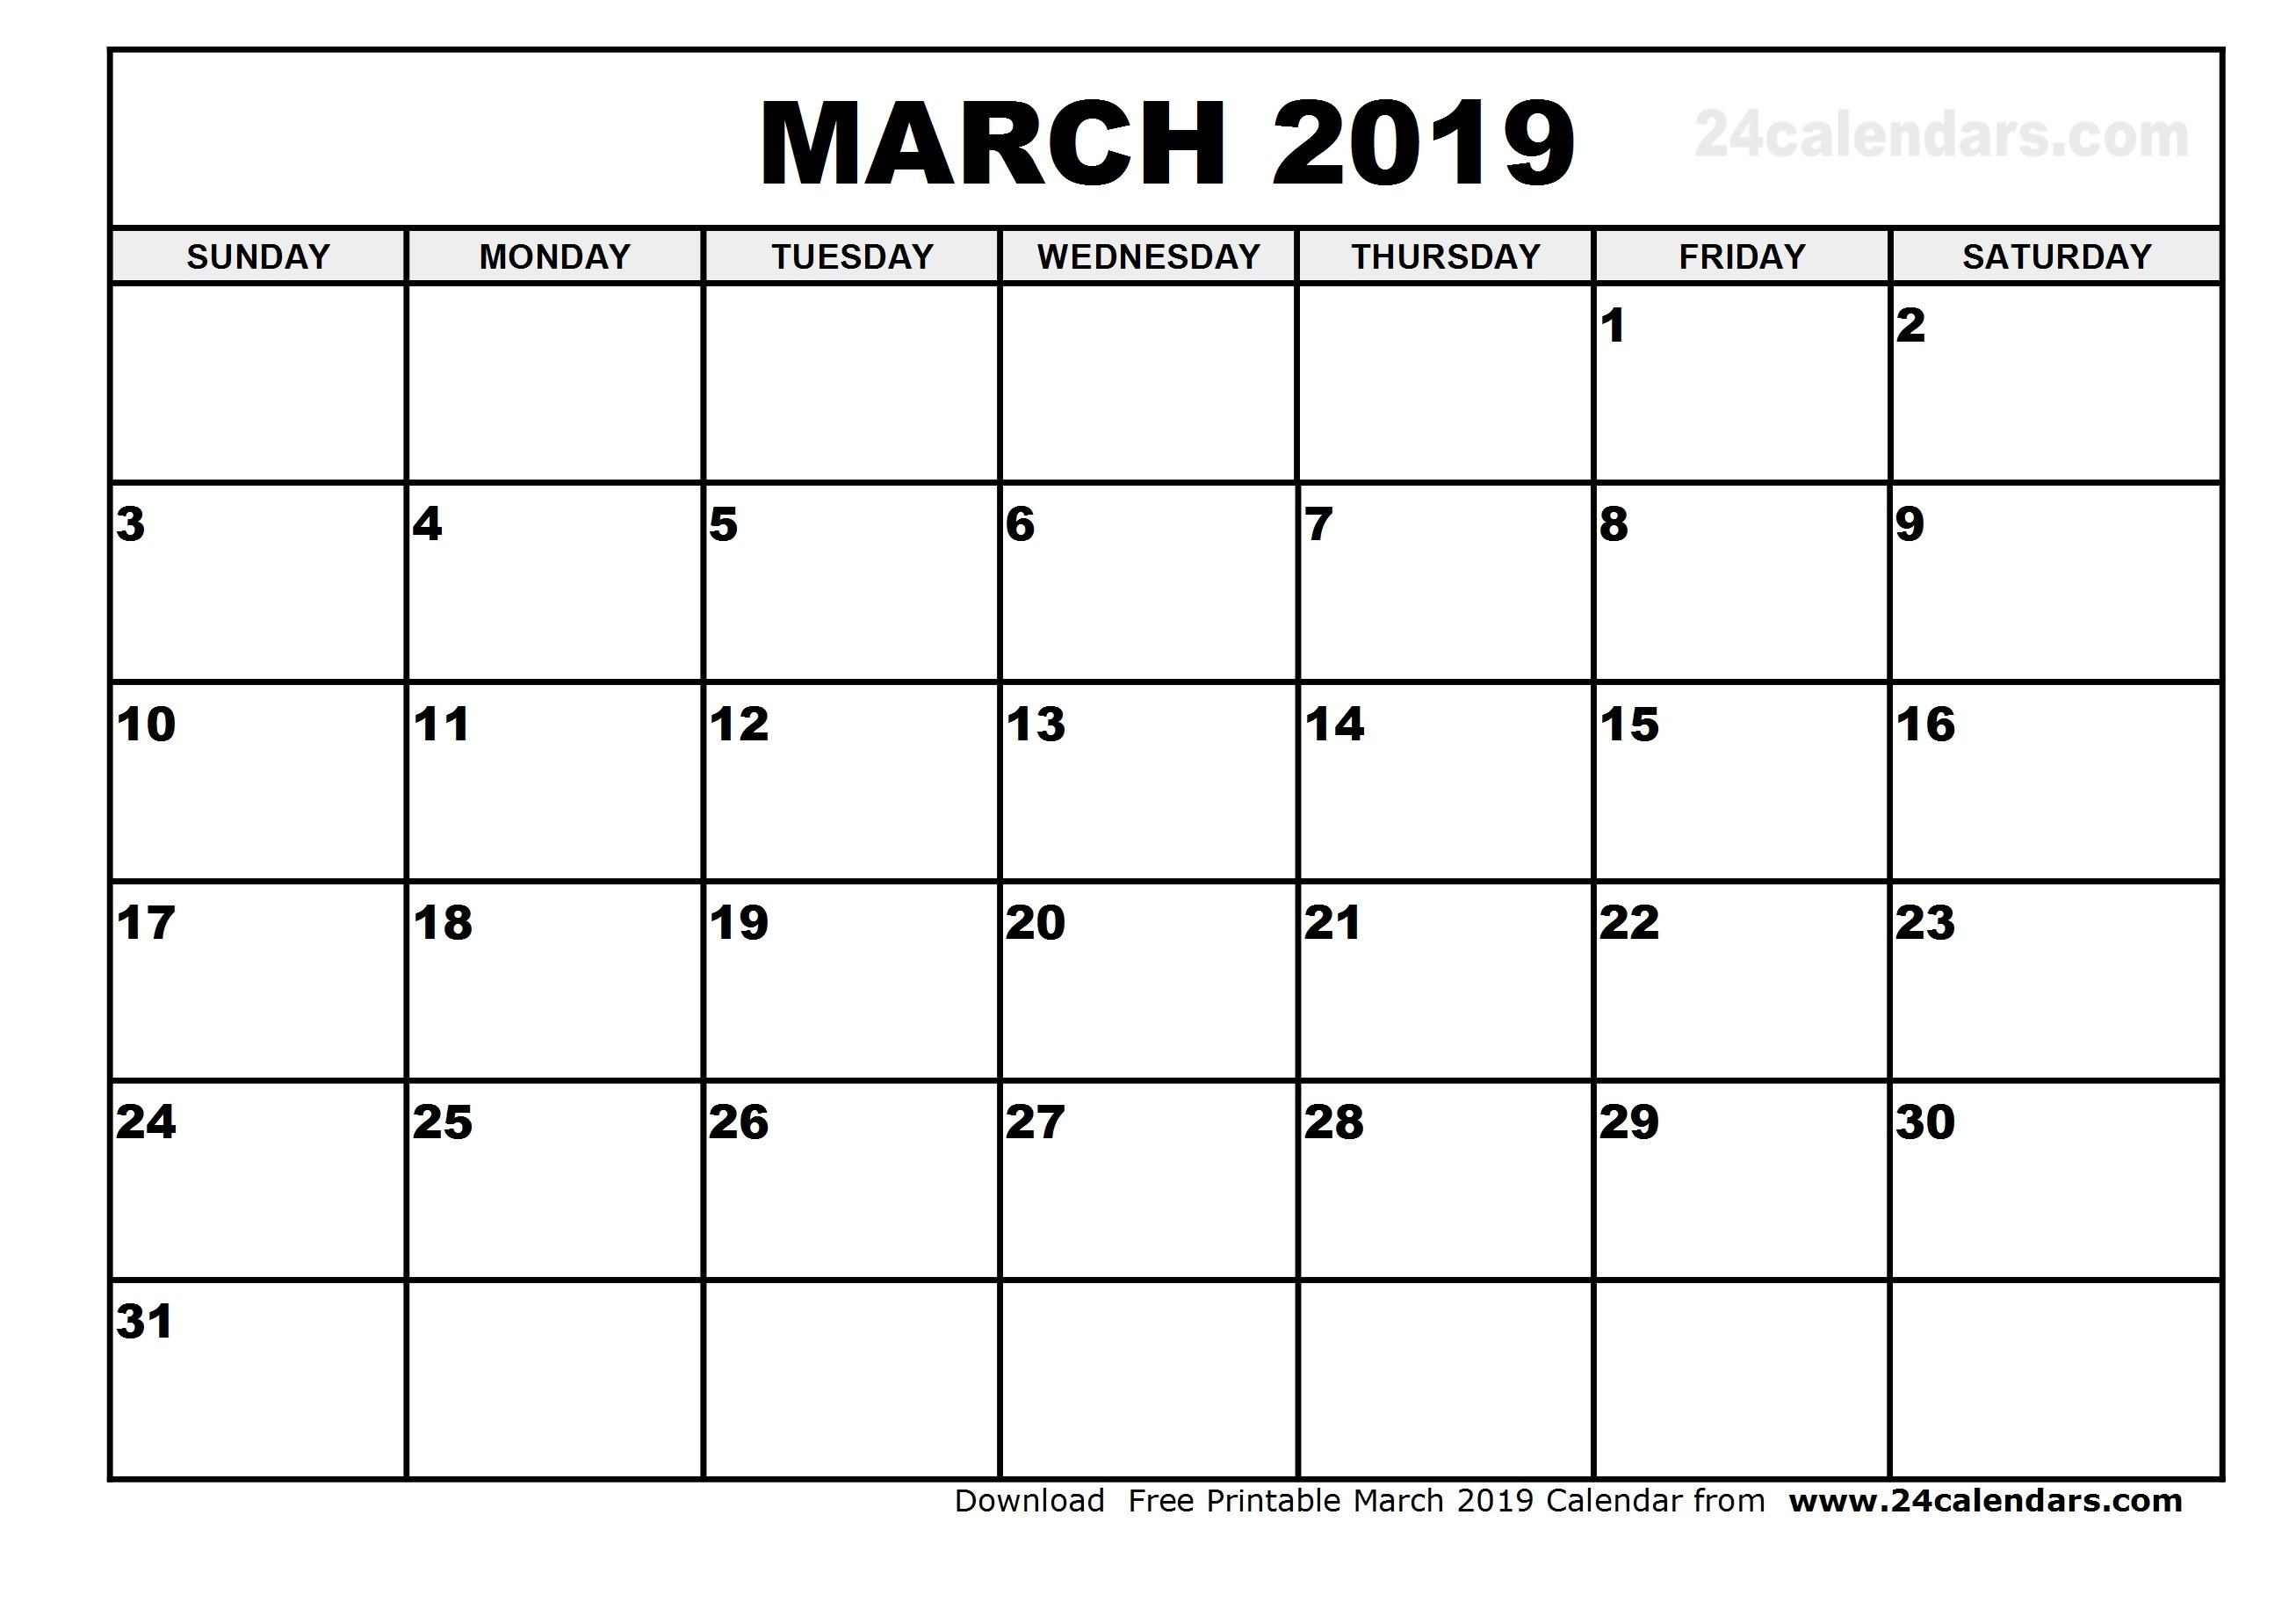 March 2019 Calendar – Printable Month Calendar March 1 2019 Calendar